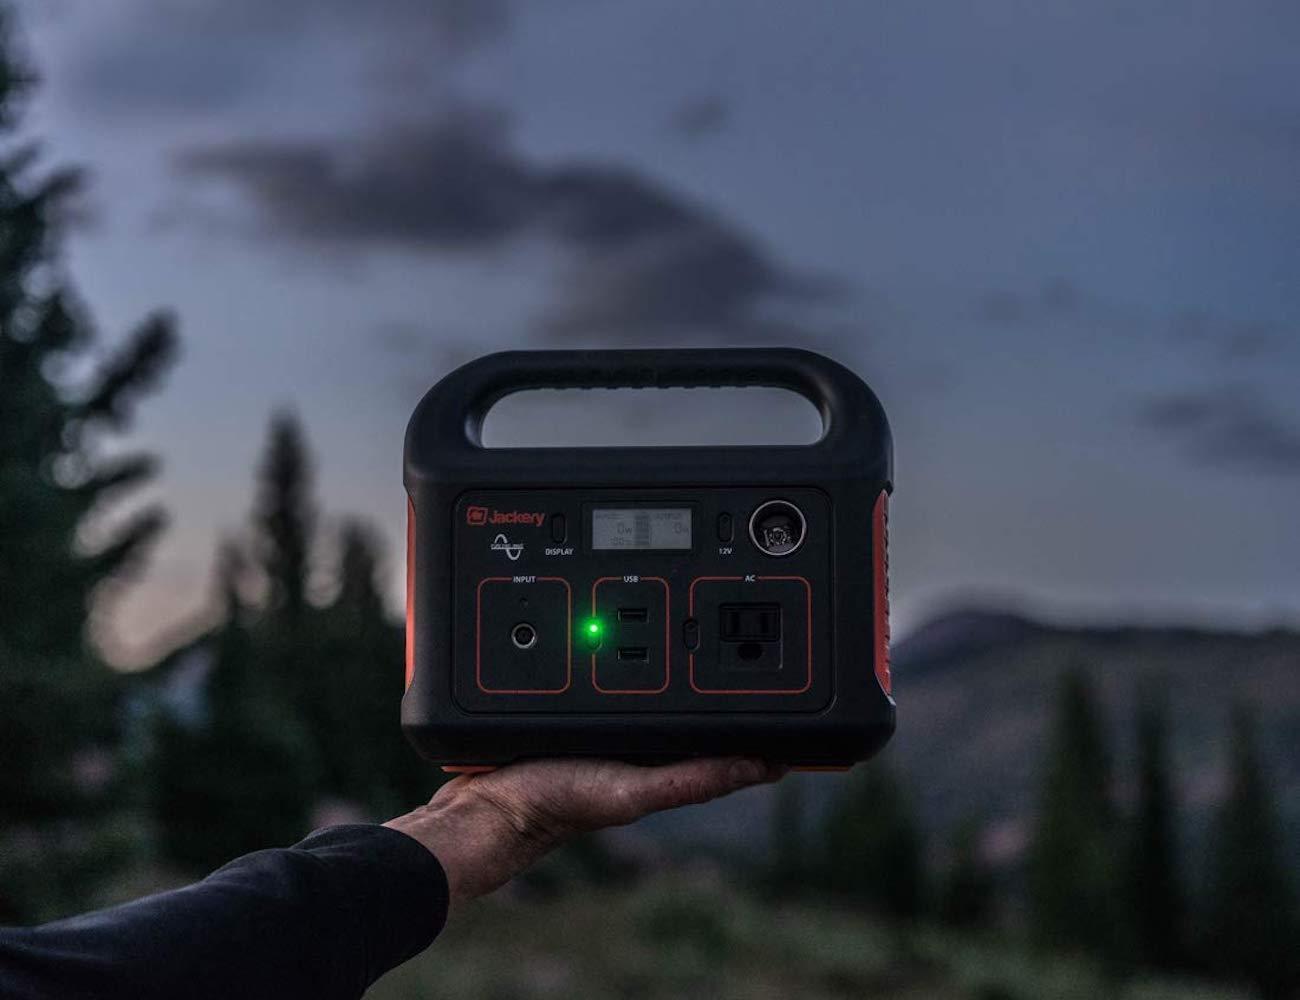 Jackery Explorer 240 Outdoor Portable Power Station